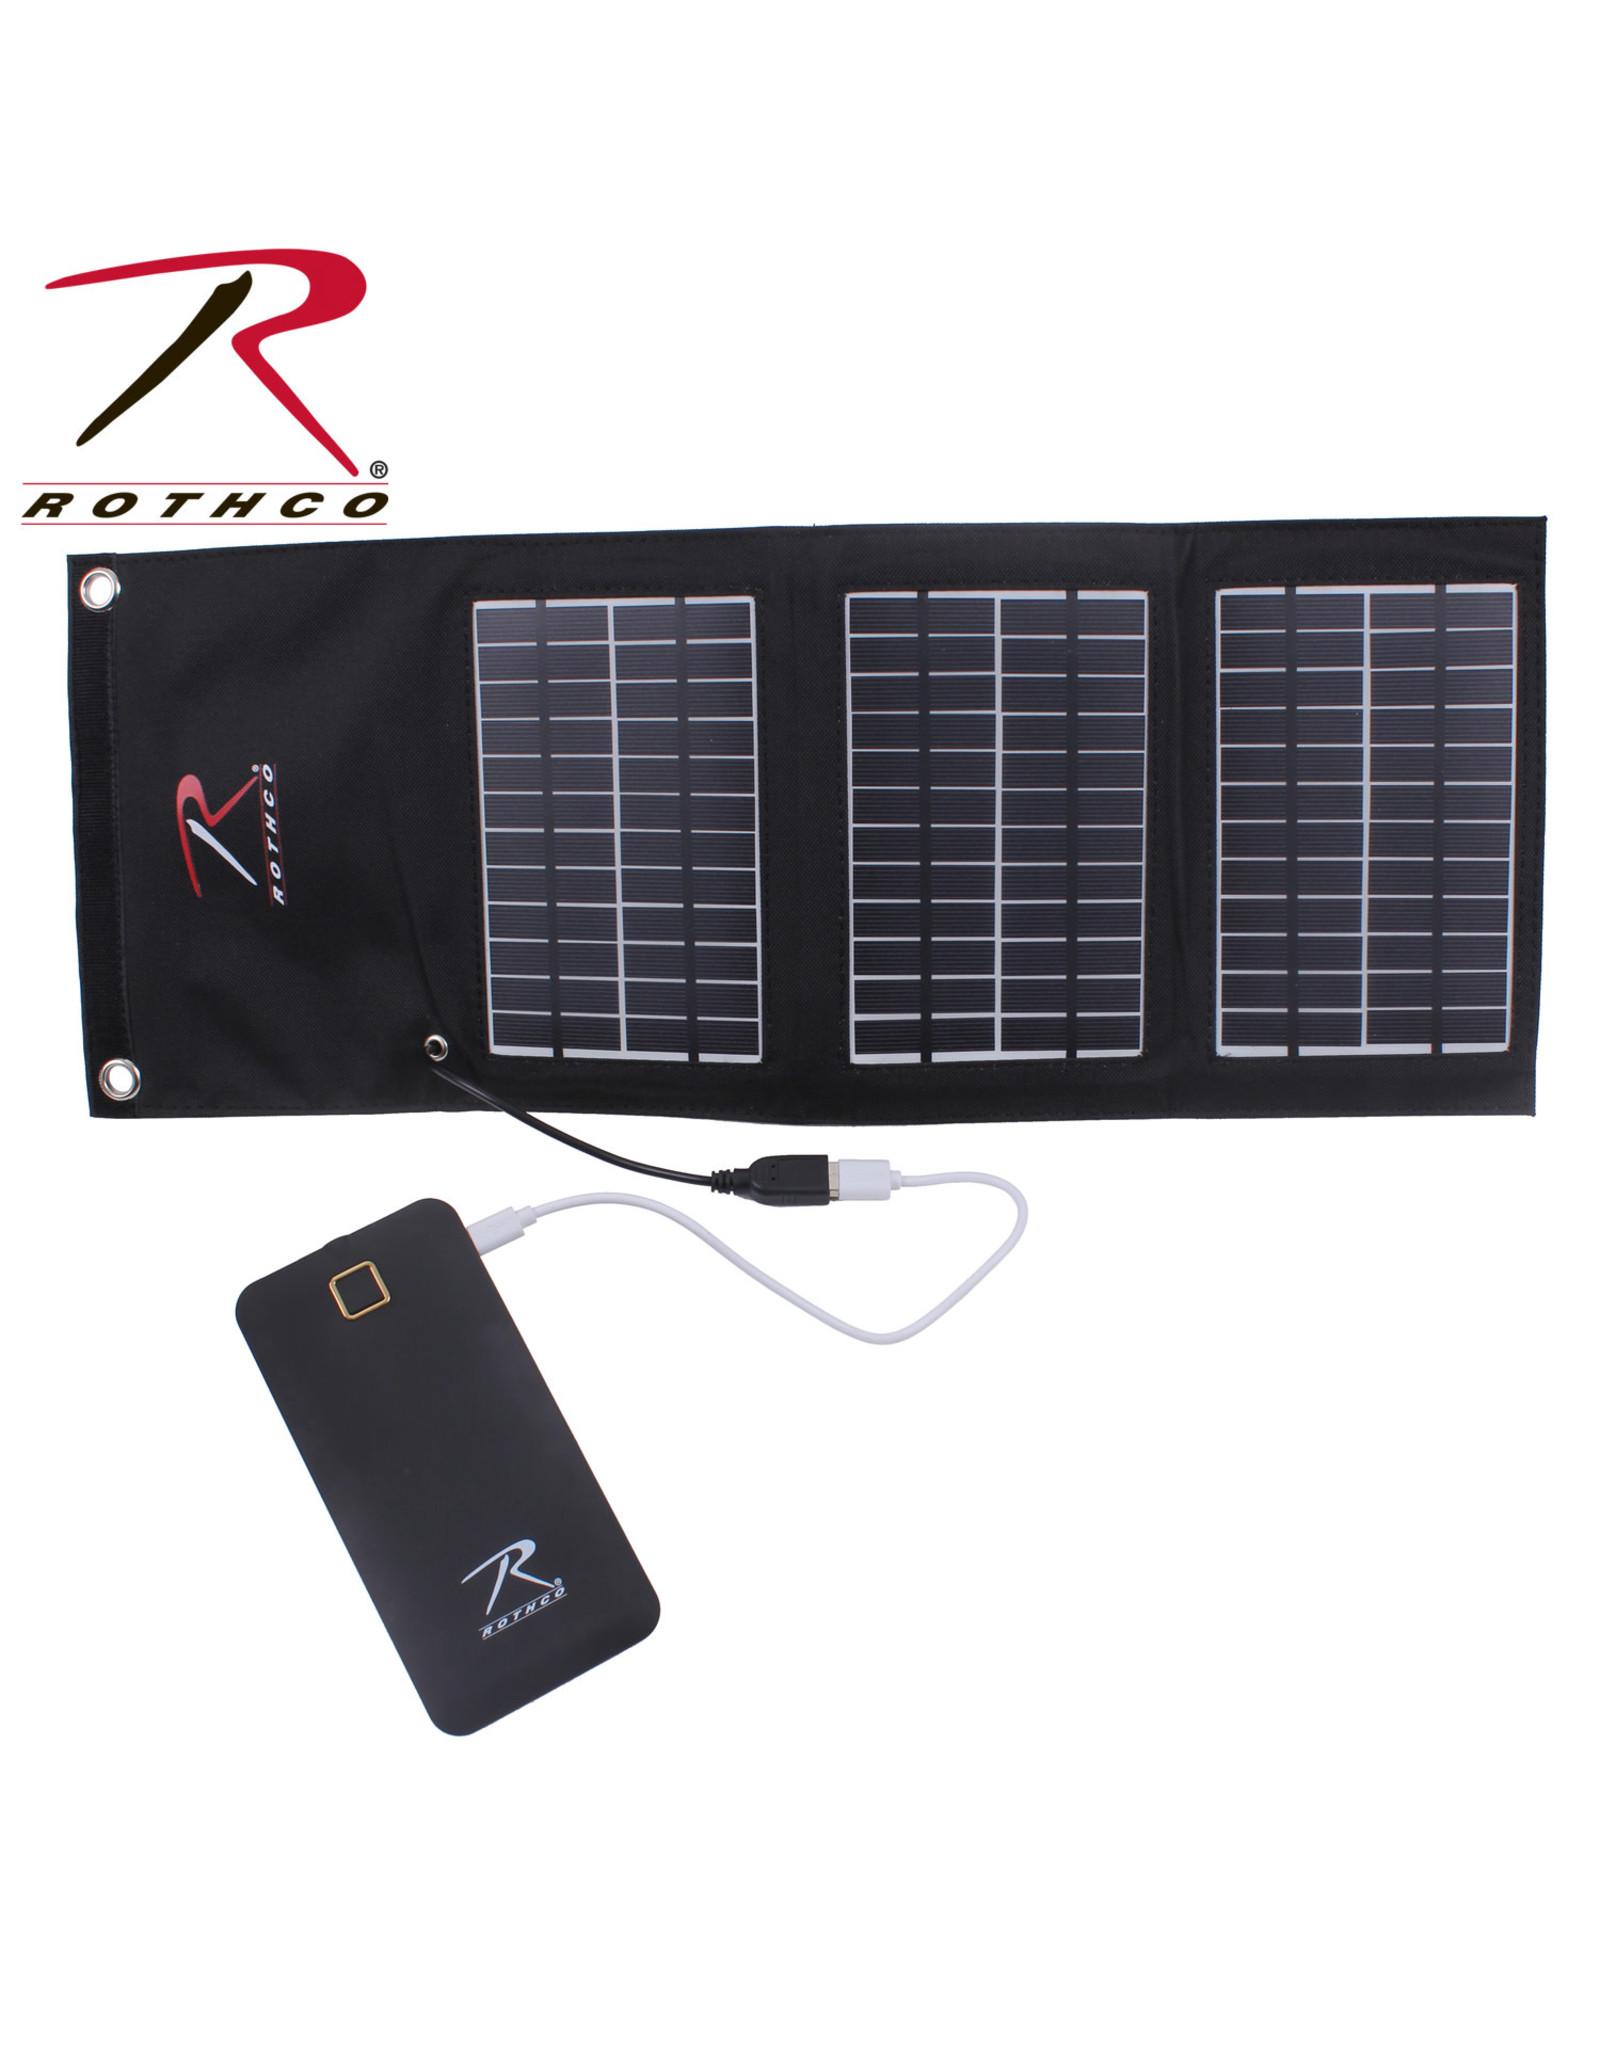 M/A Folding Solar Panel and Powerbank